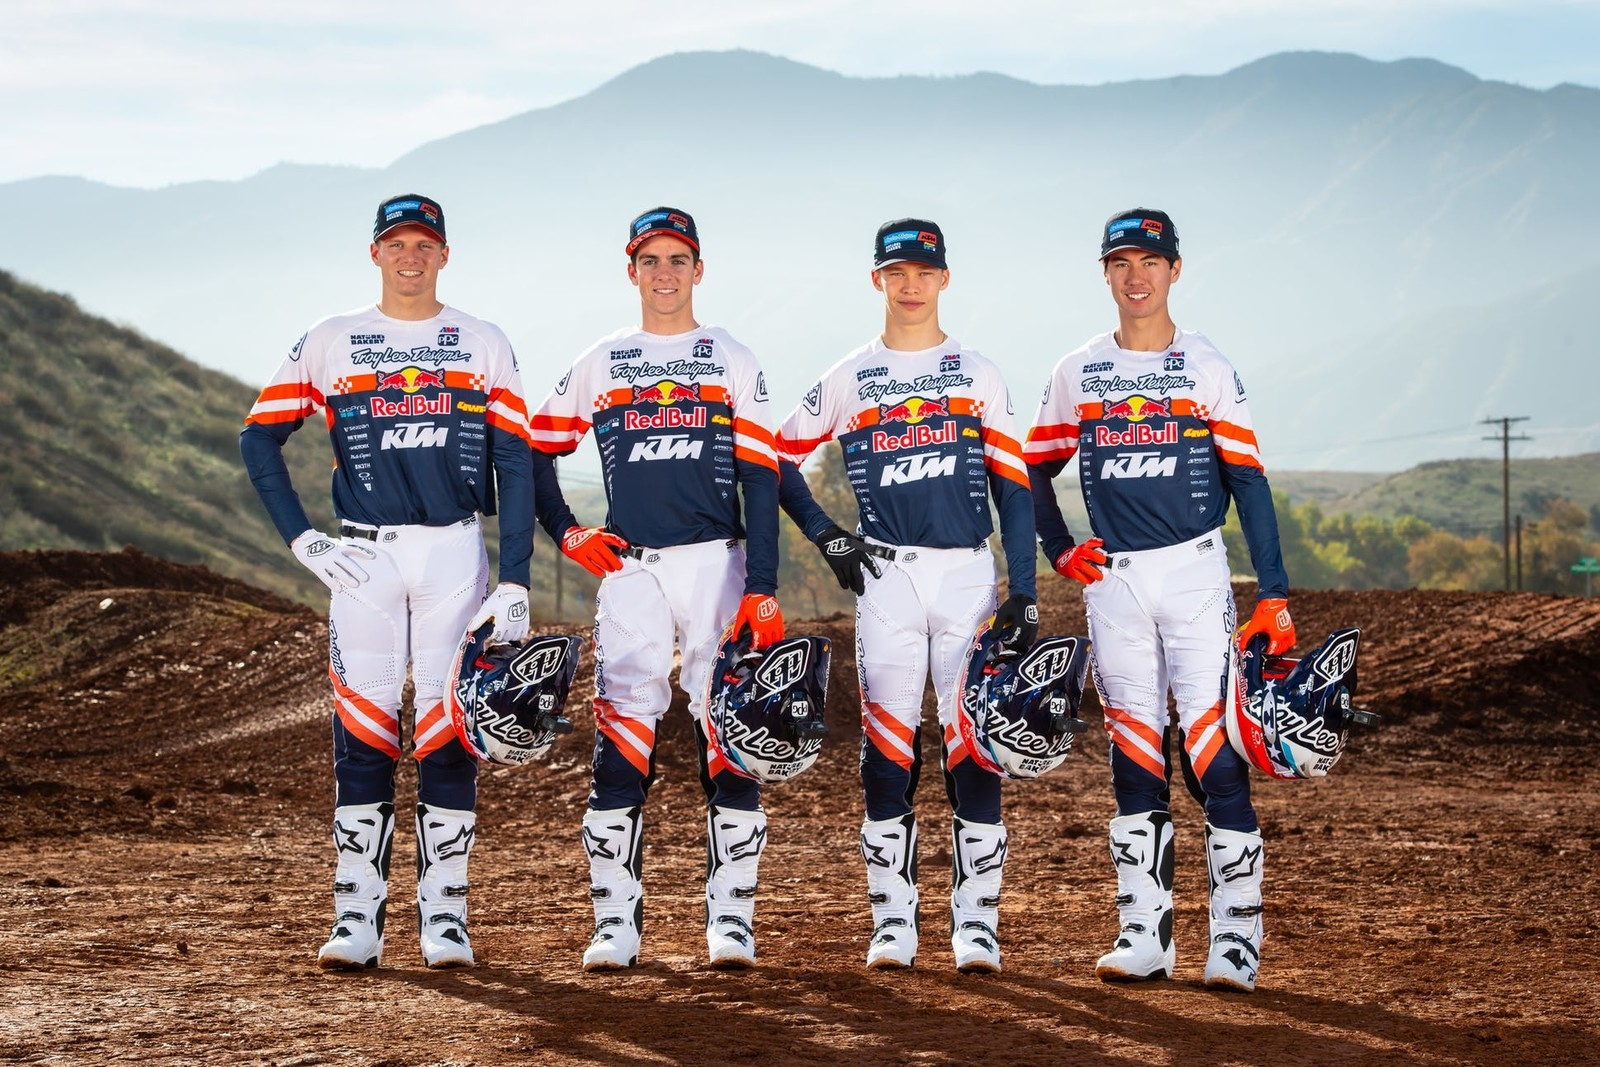 2020 Troy Lee Designs/Red Bull/KTM Season Preview